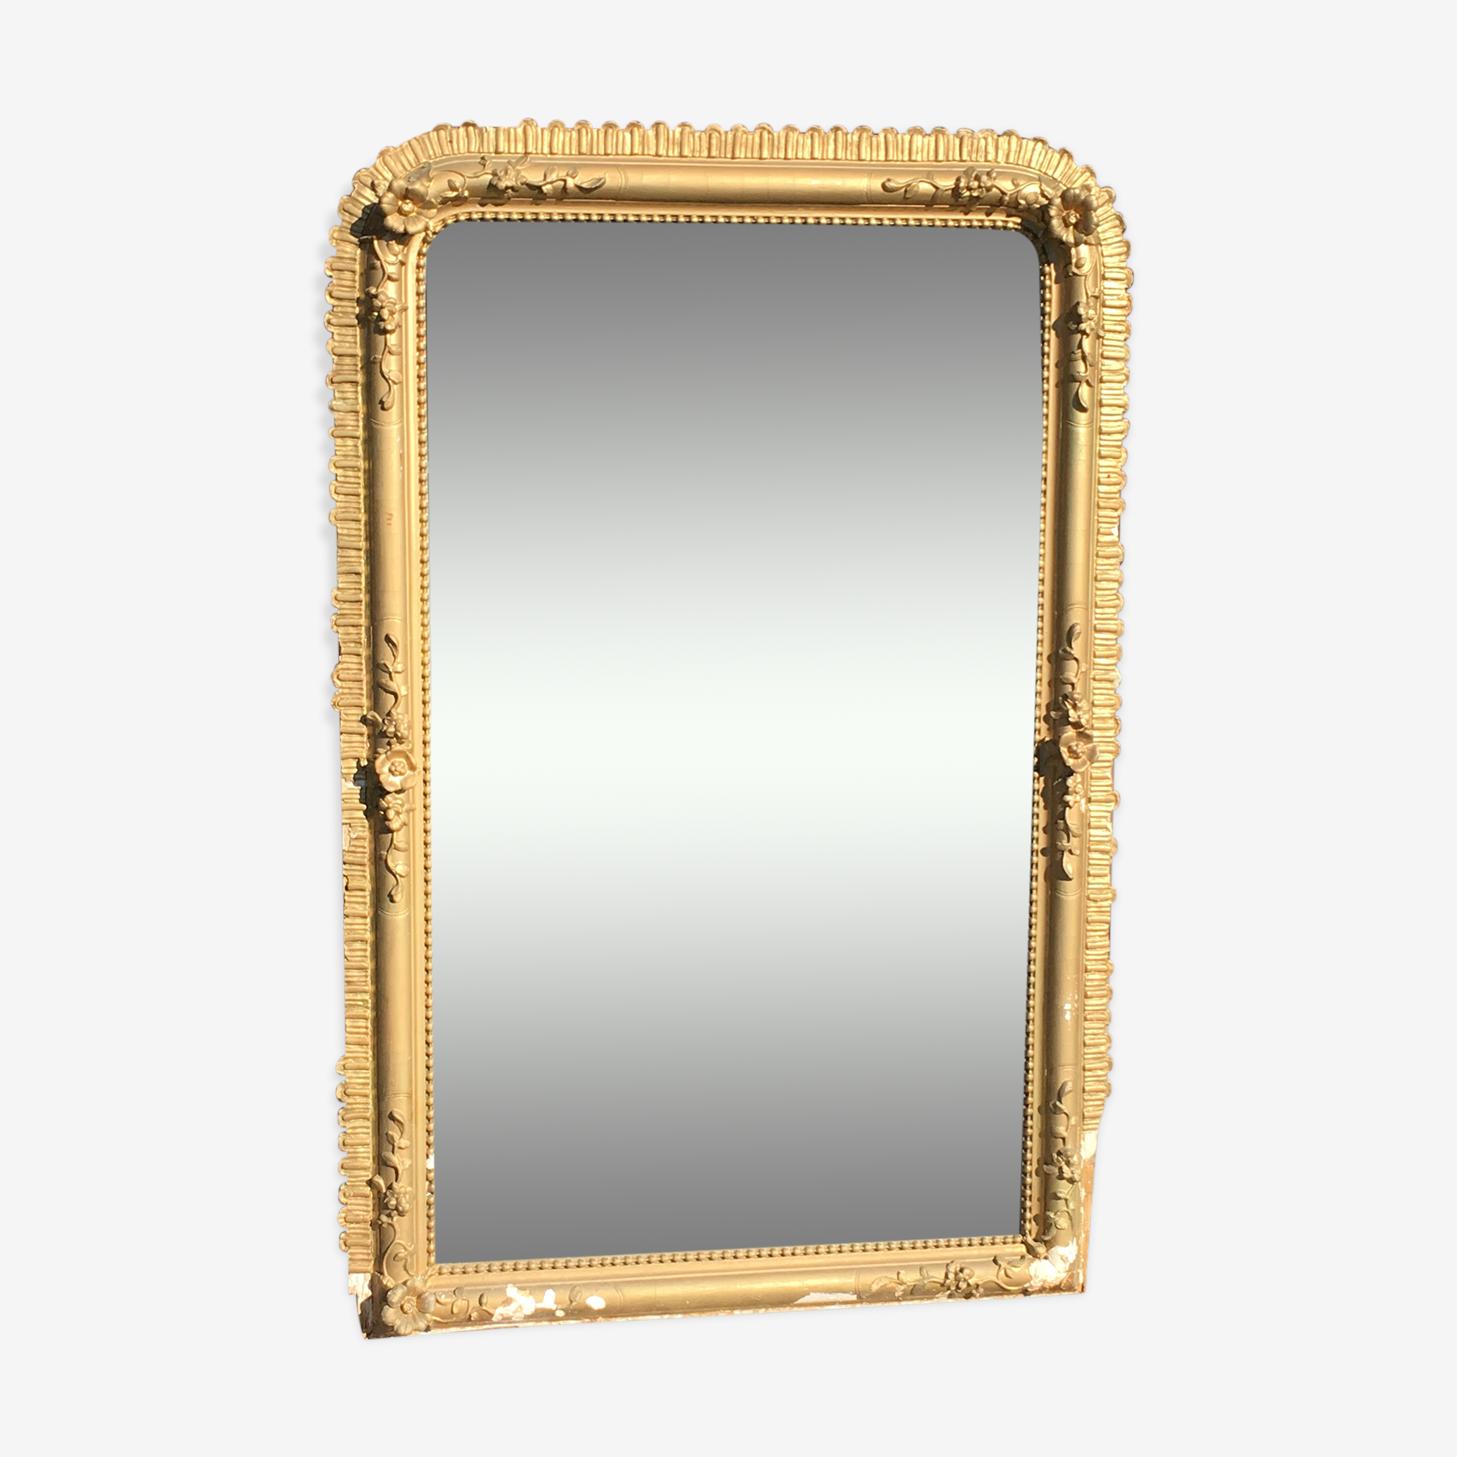 Fireplace mirror 97x145cm